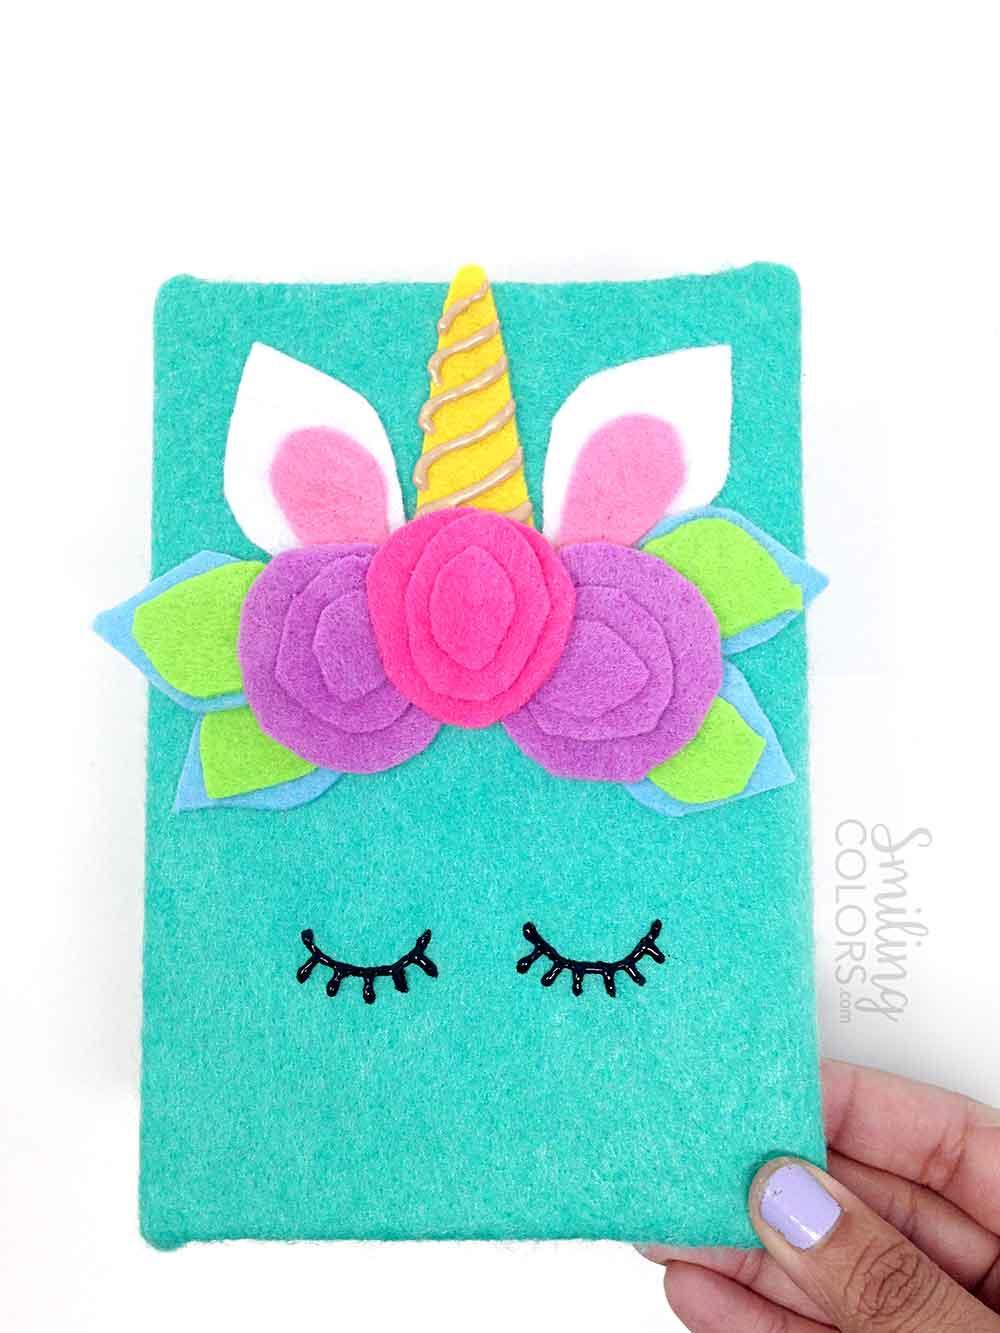 Unicorn Notebook Tutorial An Easy Beginner Felt And Glue Craft